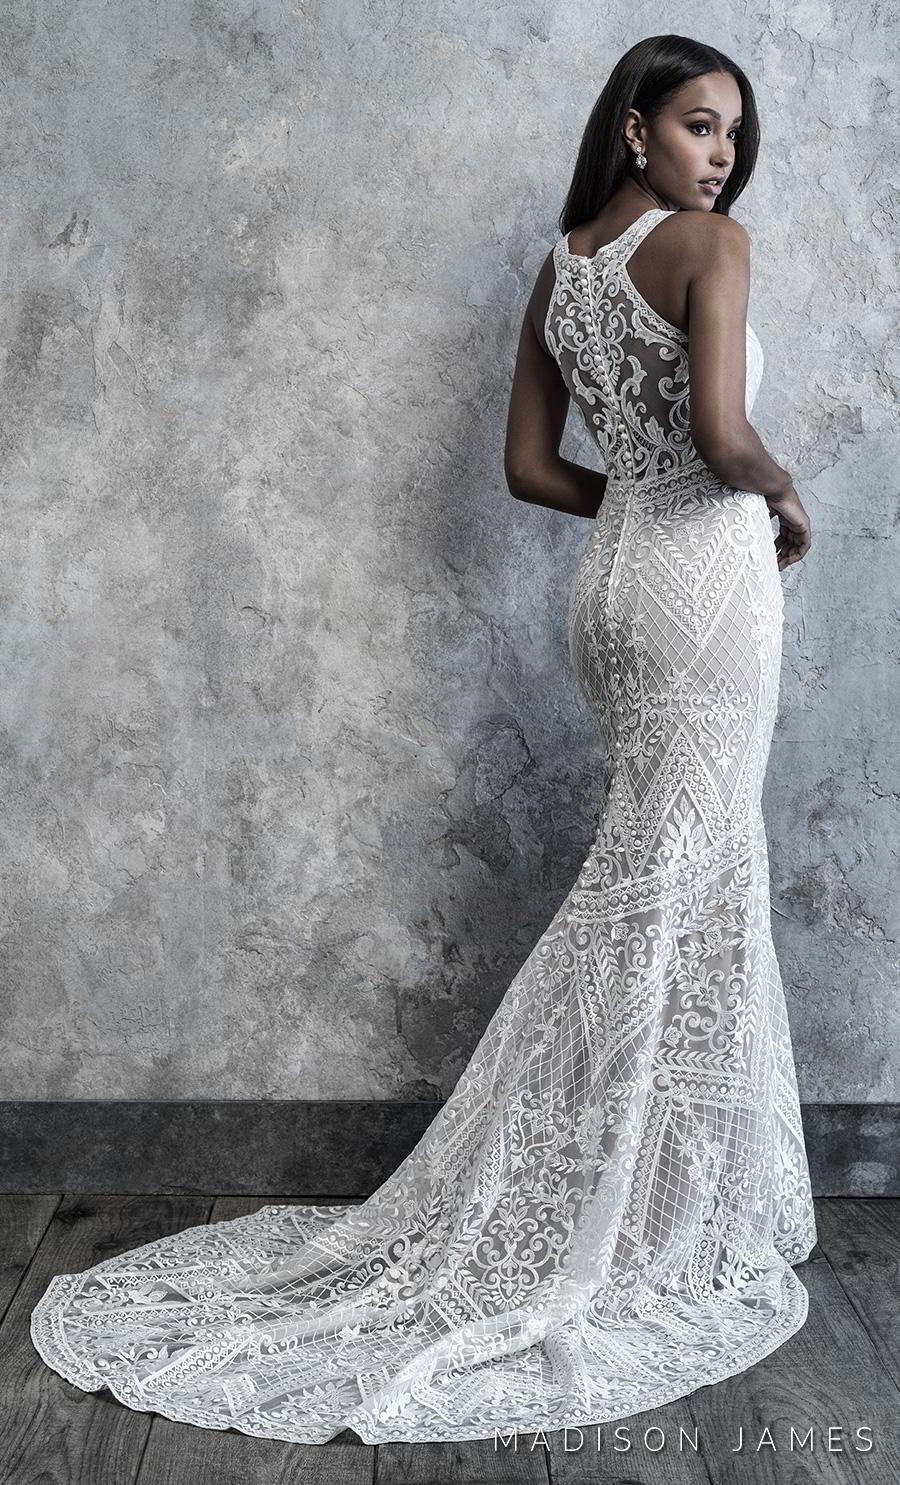 madison james 2019 bridal sleeveless jewel neckline full embellishment elegant sheath wedding dress covered lace back chapel train (507) bv